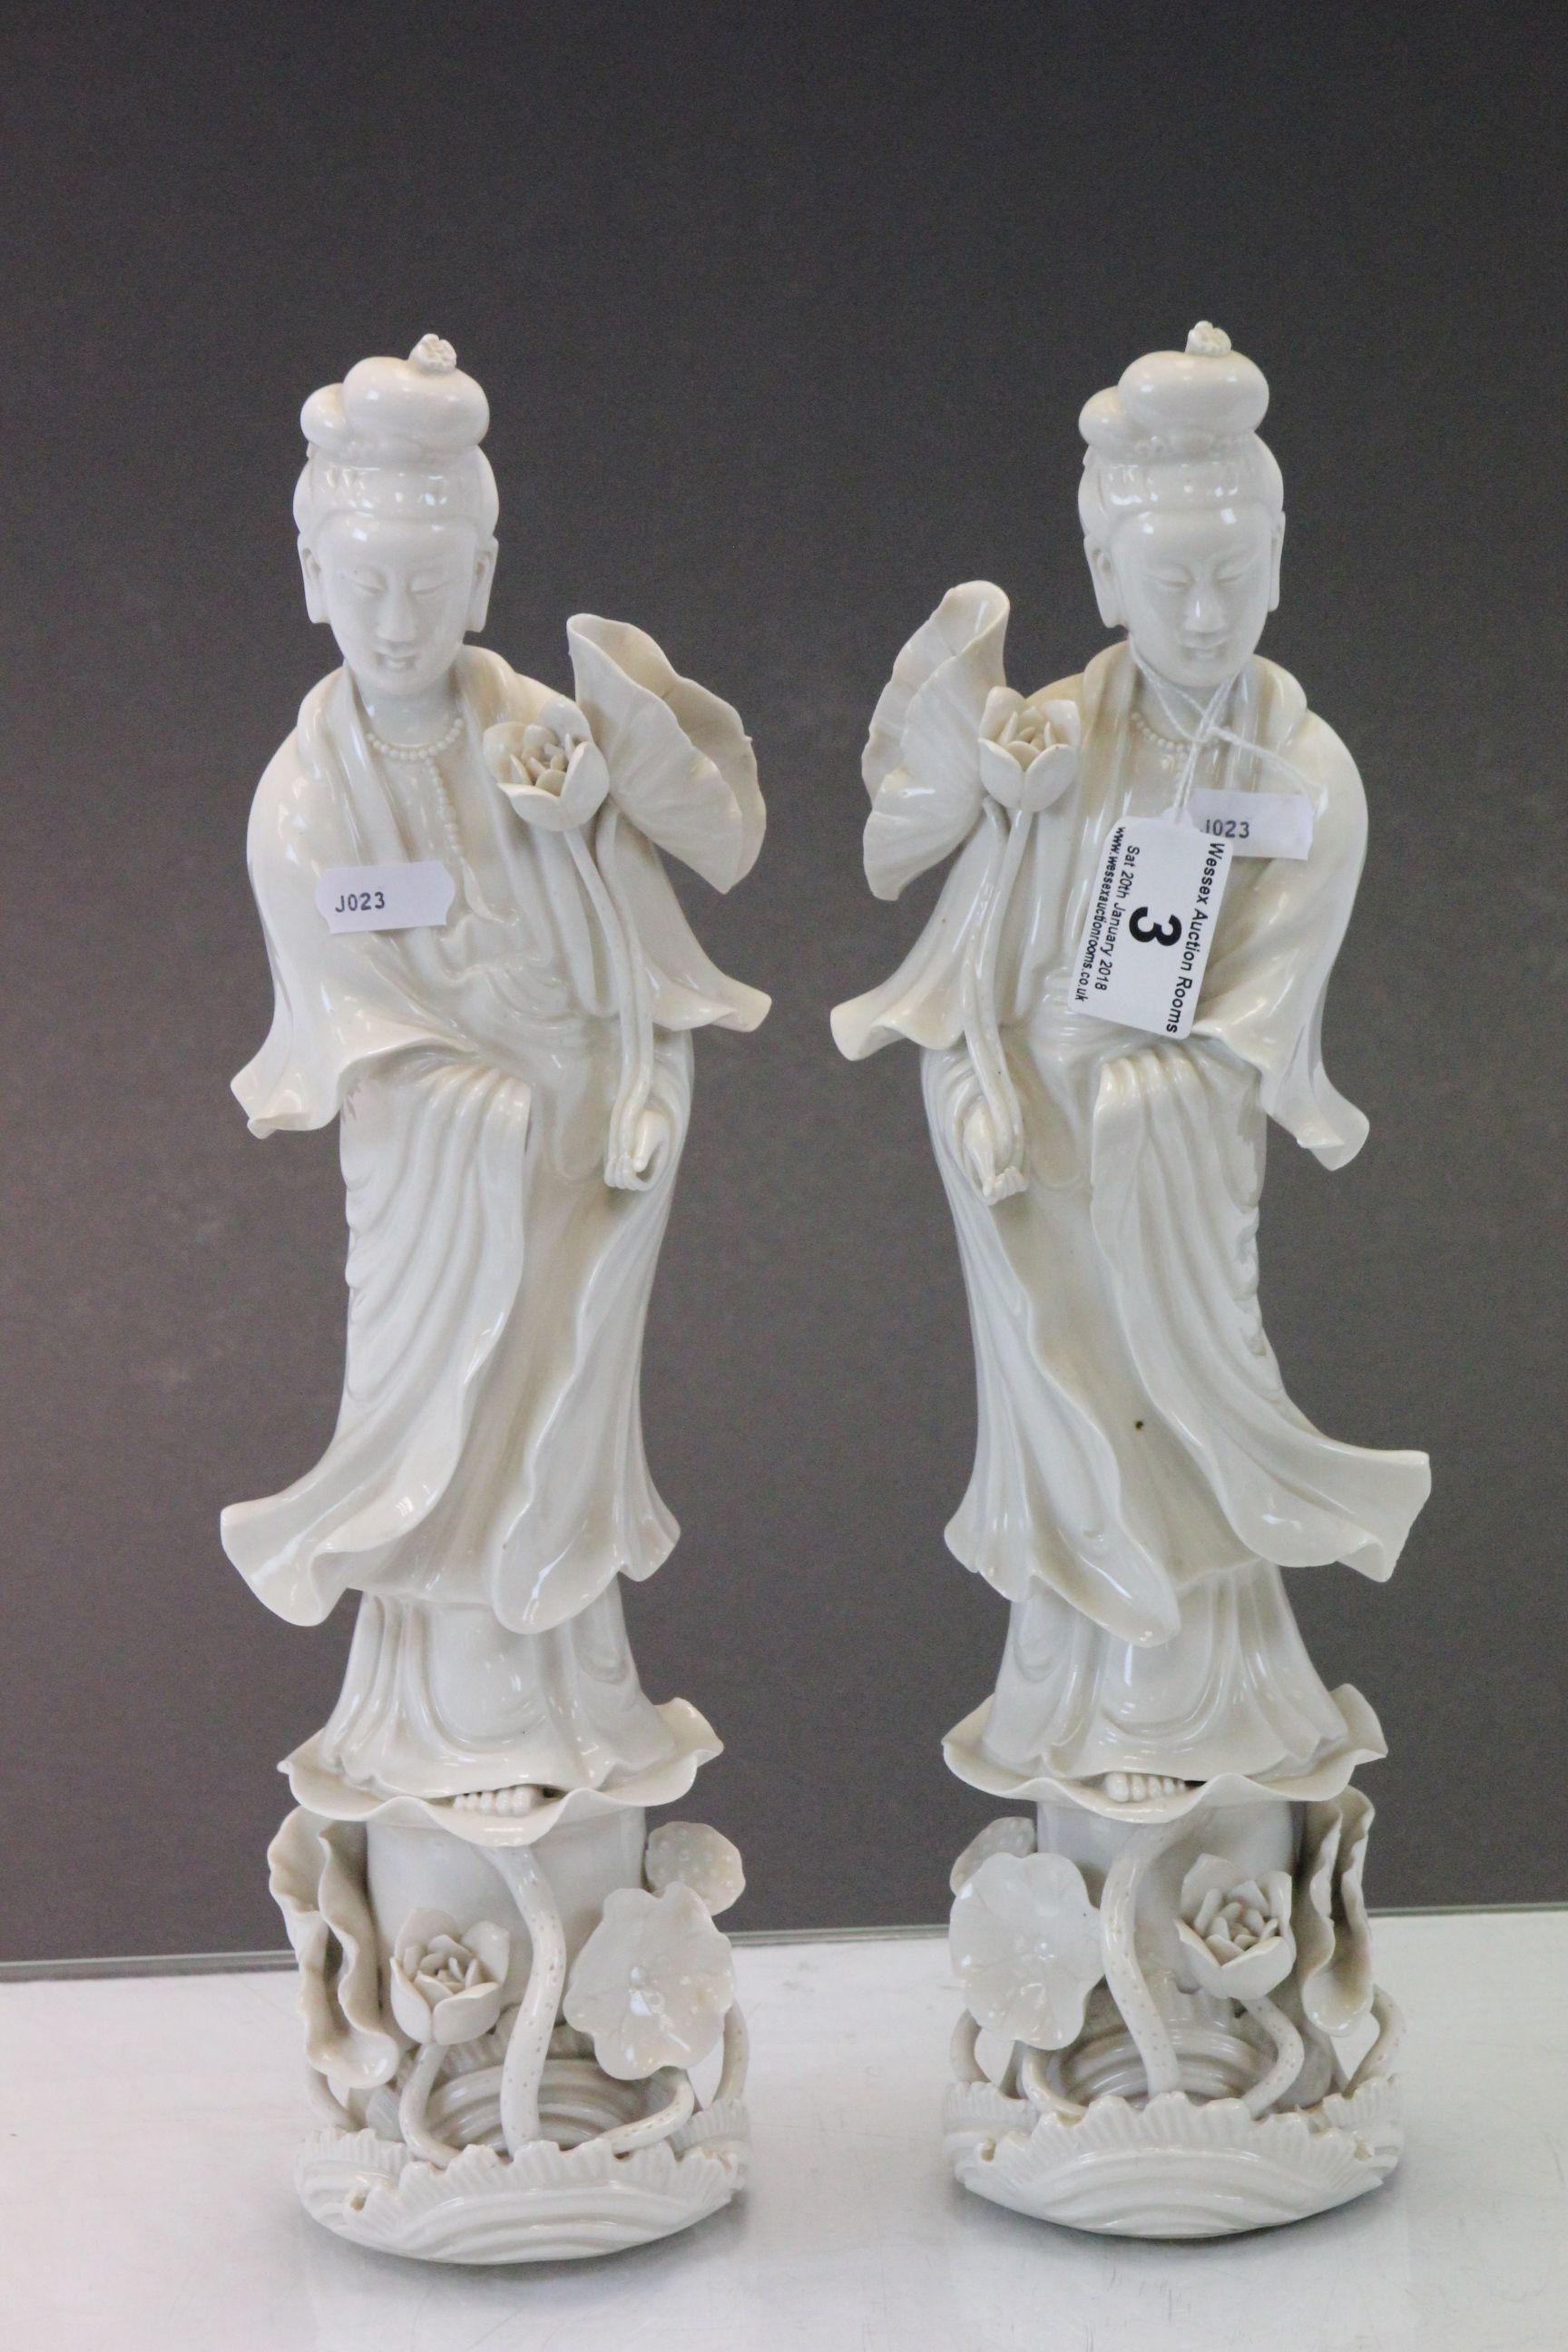 Lot 3 - Pair of Oriental Blanc de Chine figures, possibly Guan Yin